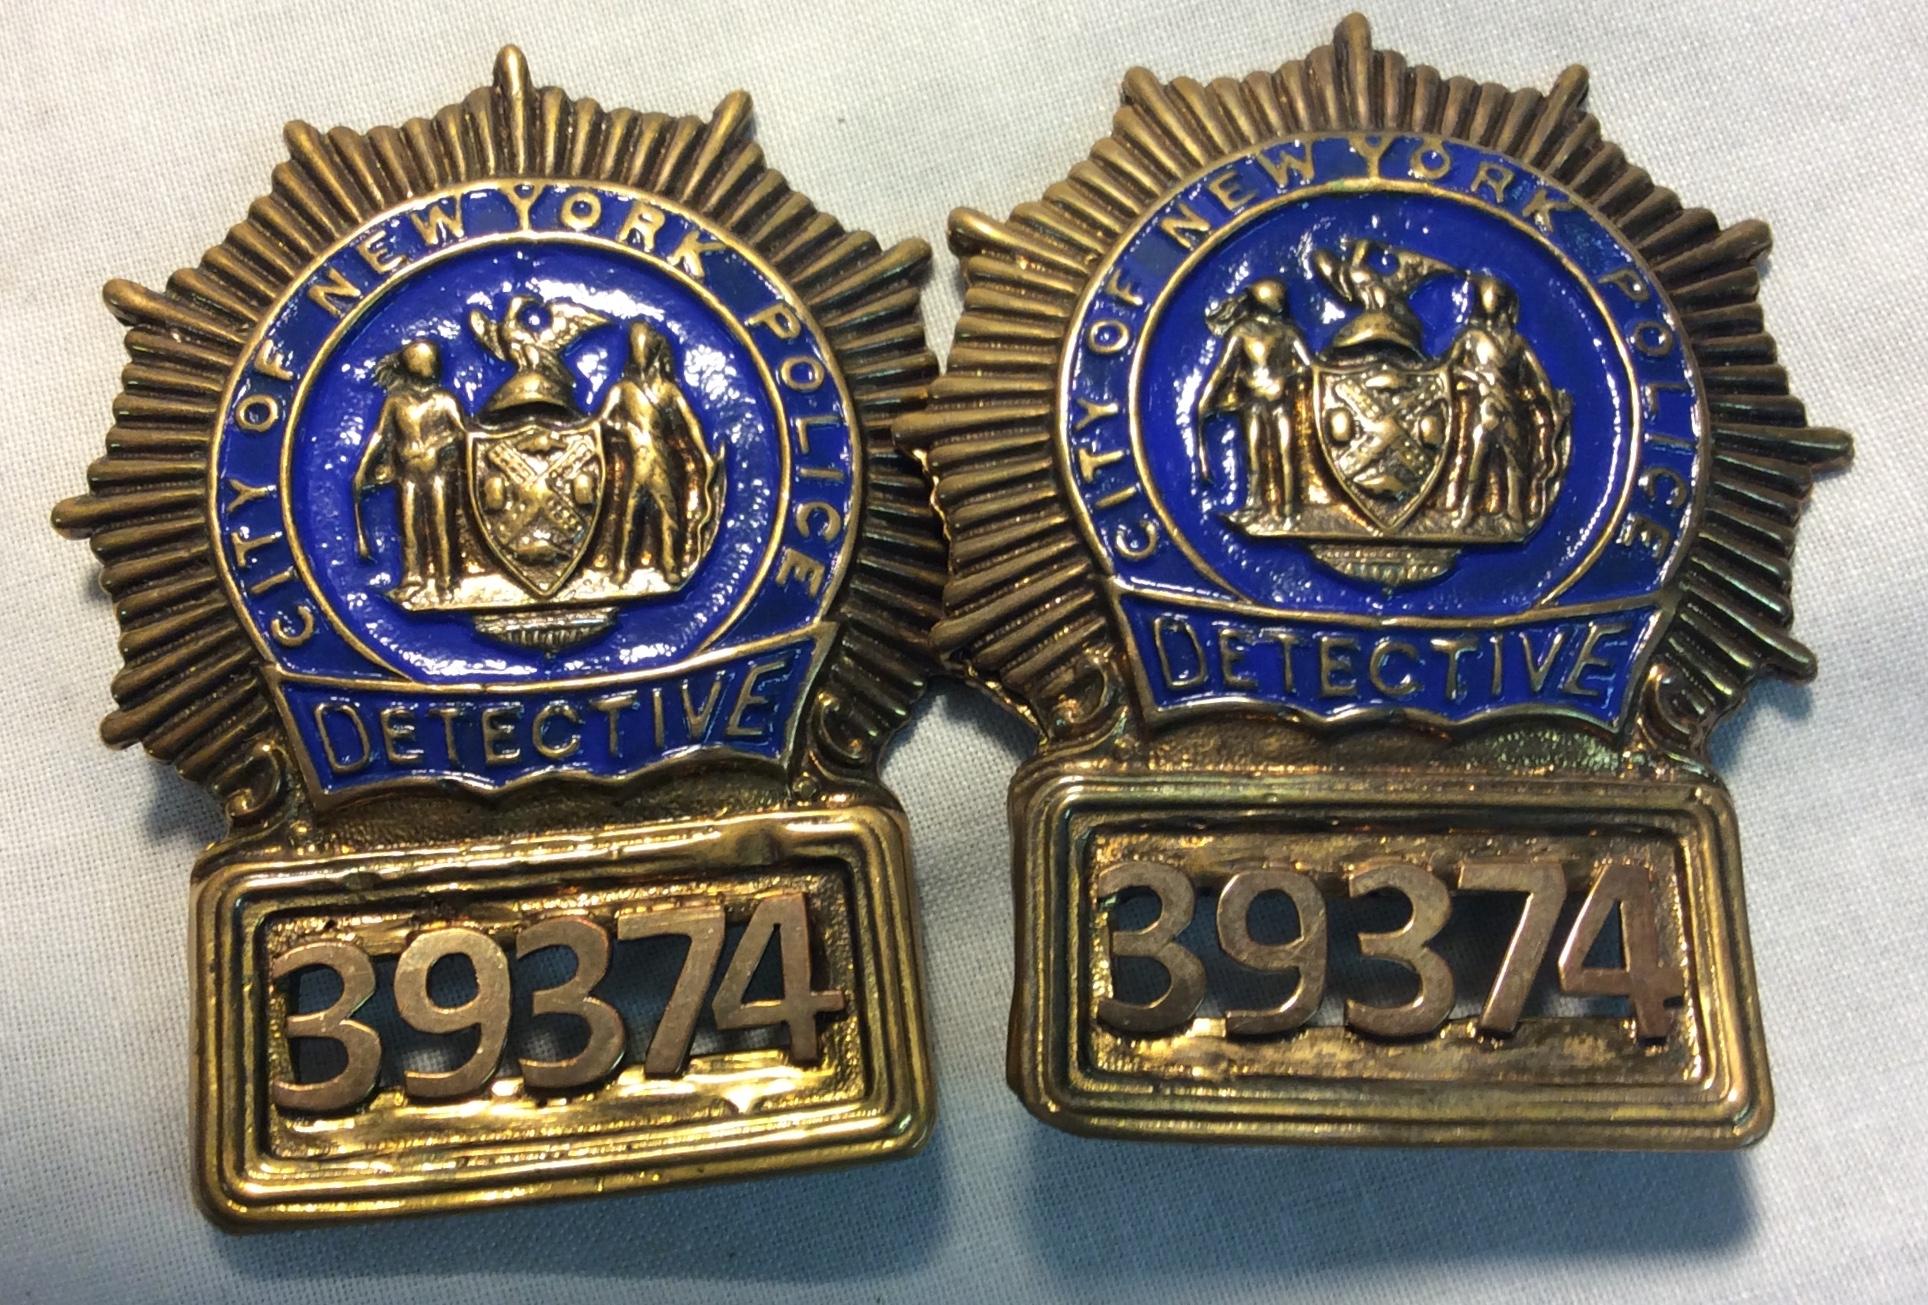 New York Detective badge